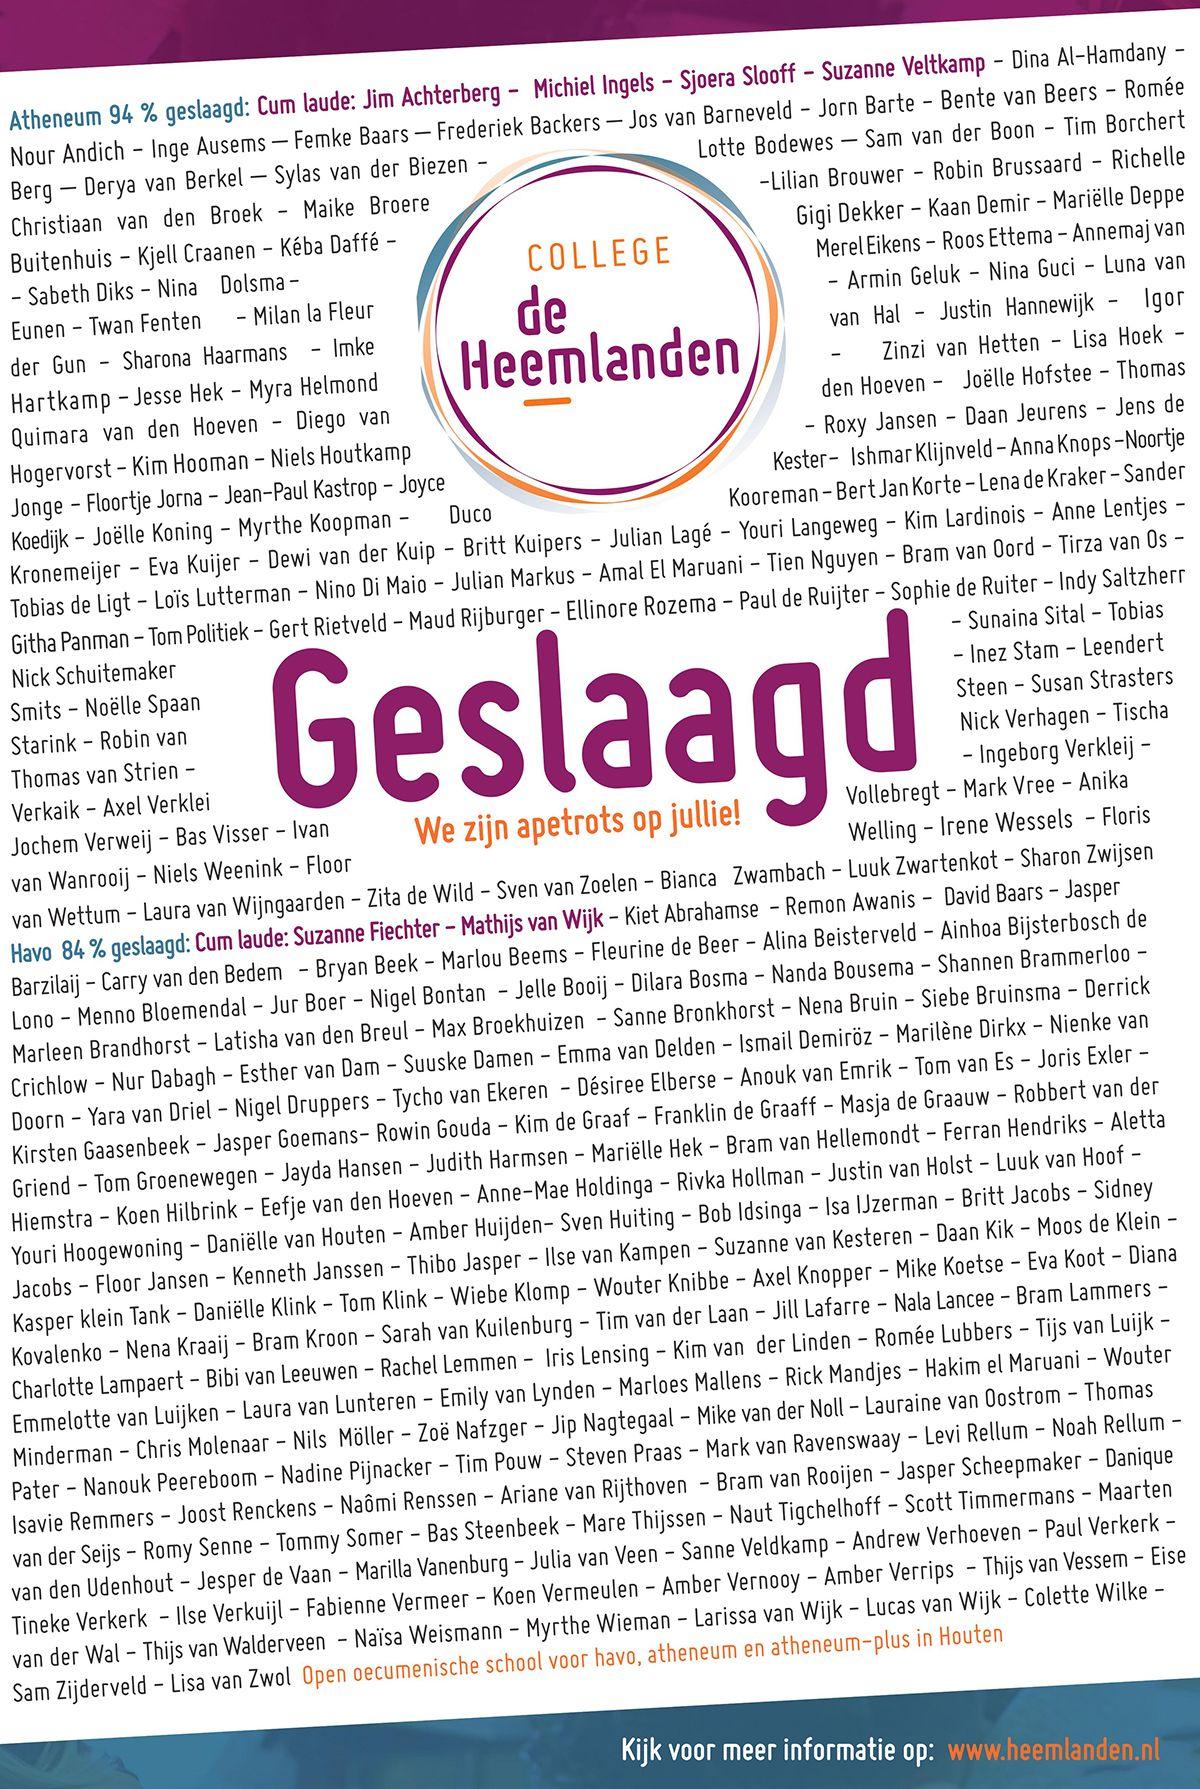 Diploma-uitreiking | Heemlanden | Timmermans-Vaneerdewegh Genealogie ...